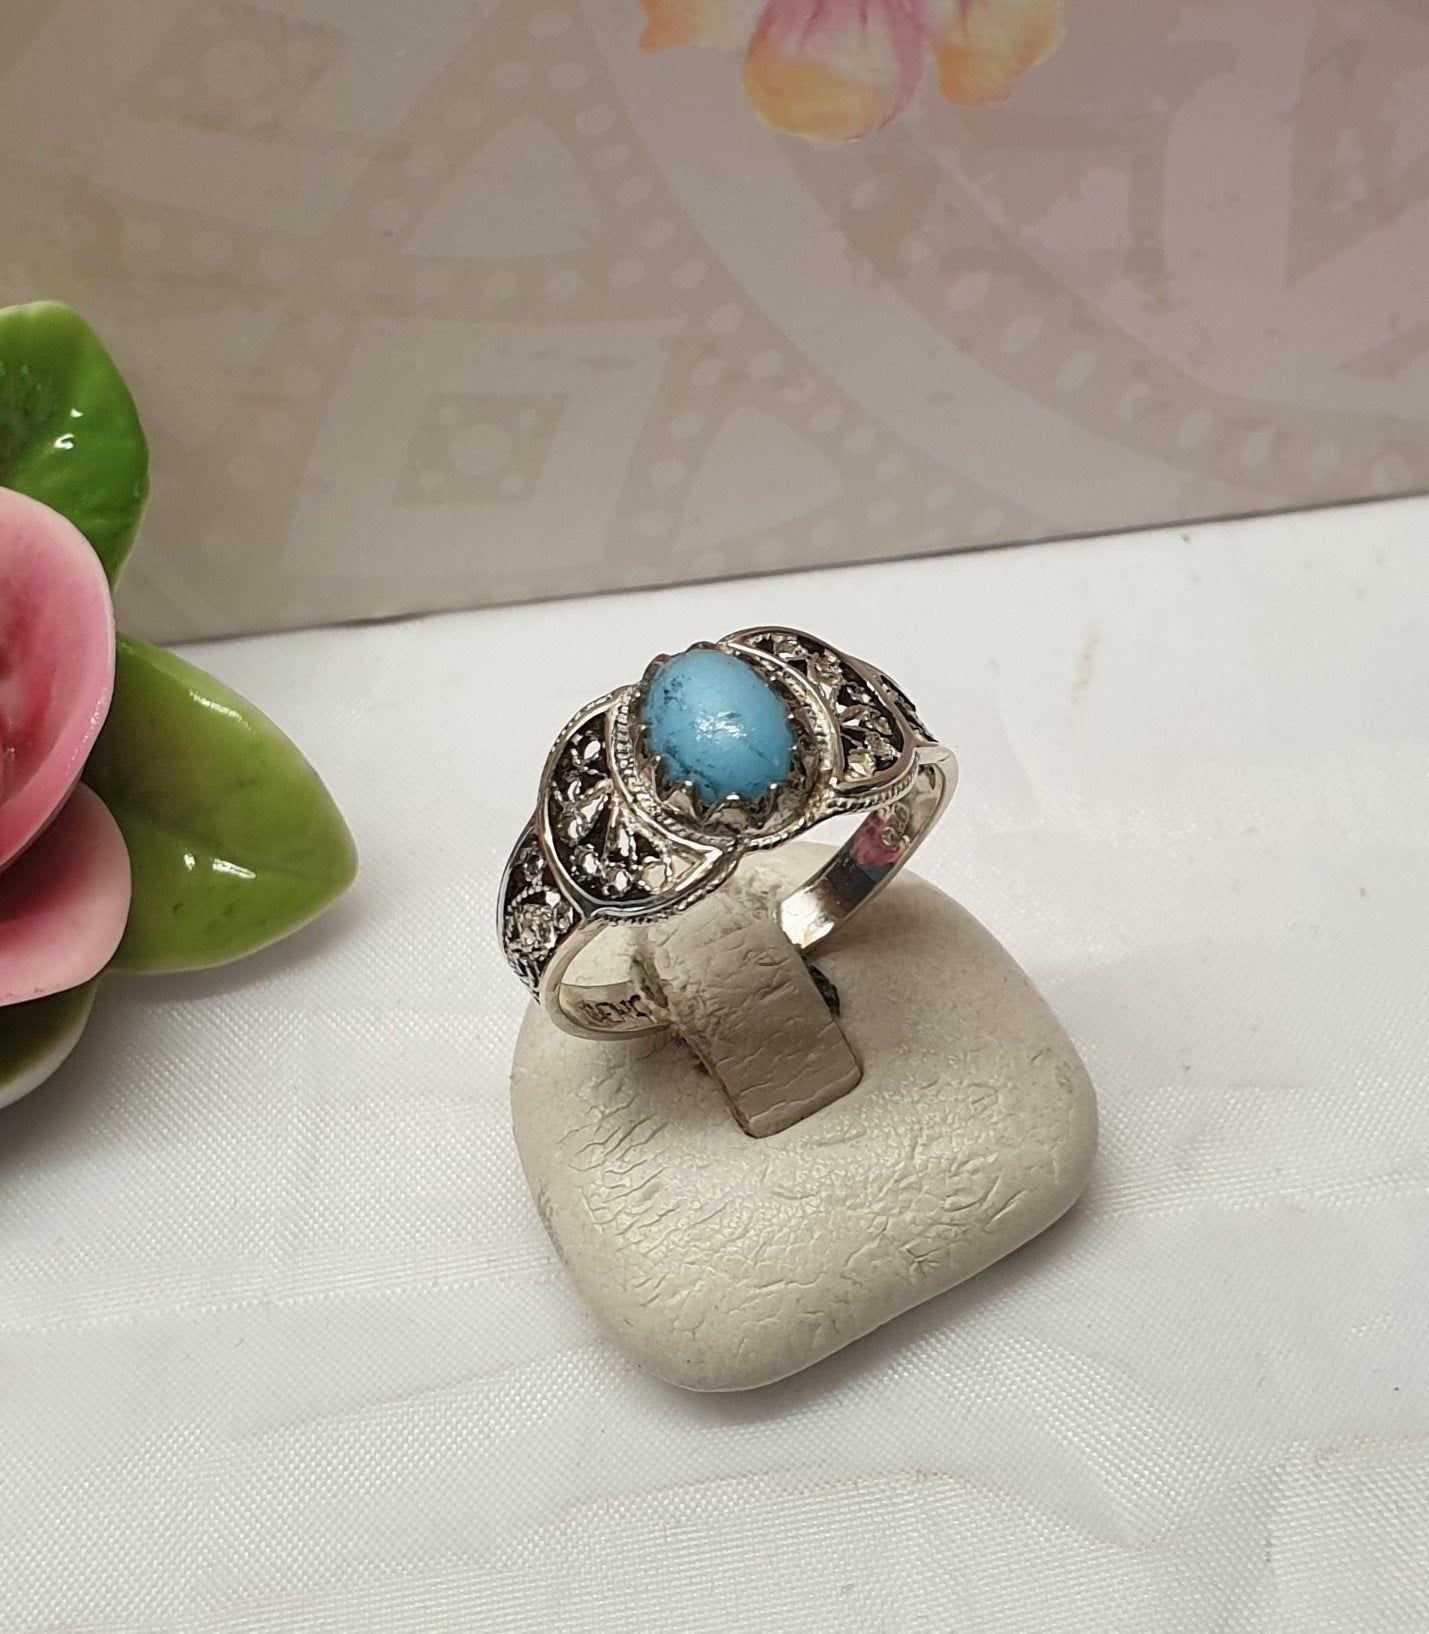 195 mm Nostalgischer Vintage Ring Silber 925 Türkis | Etsy